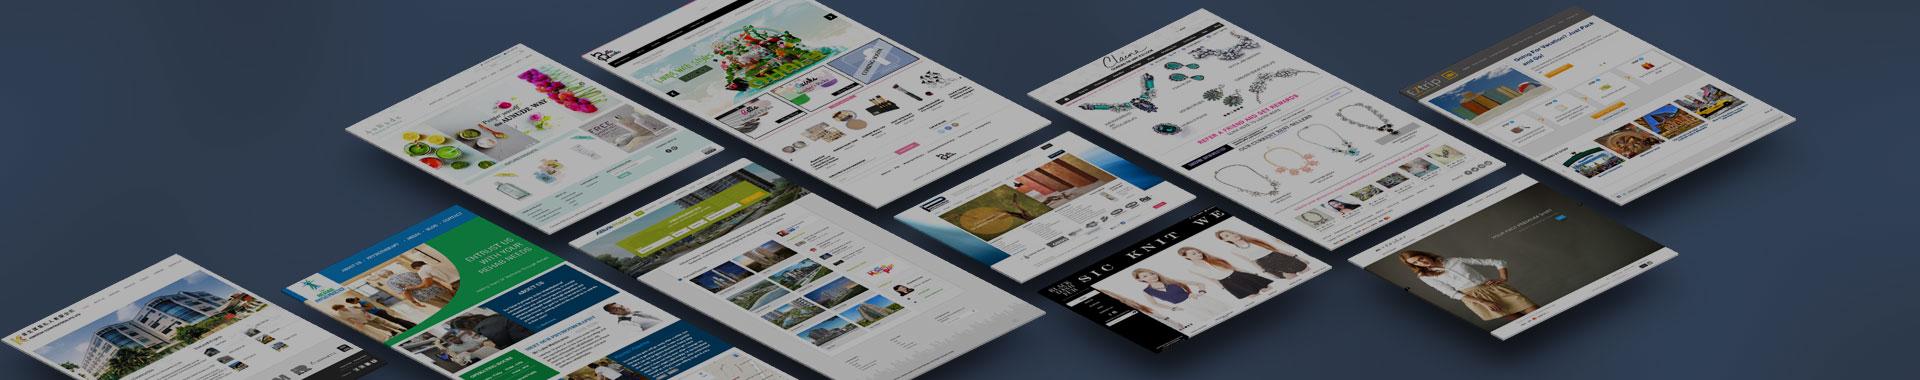 Website Design Singapore - Axel Storage